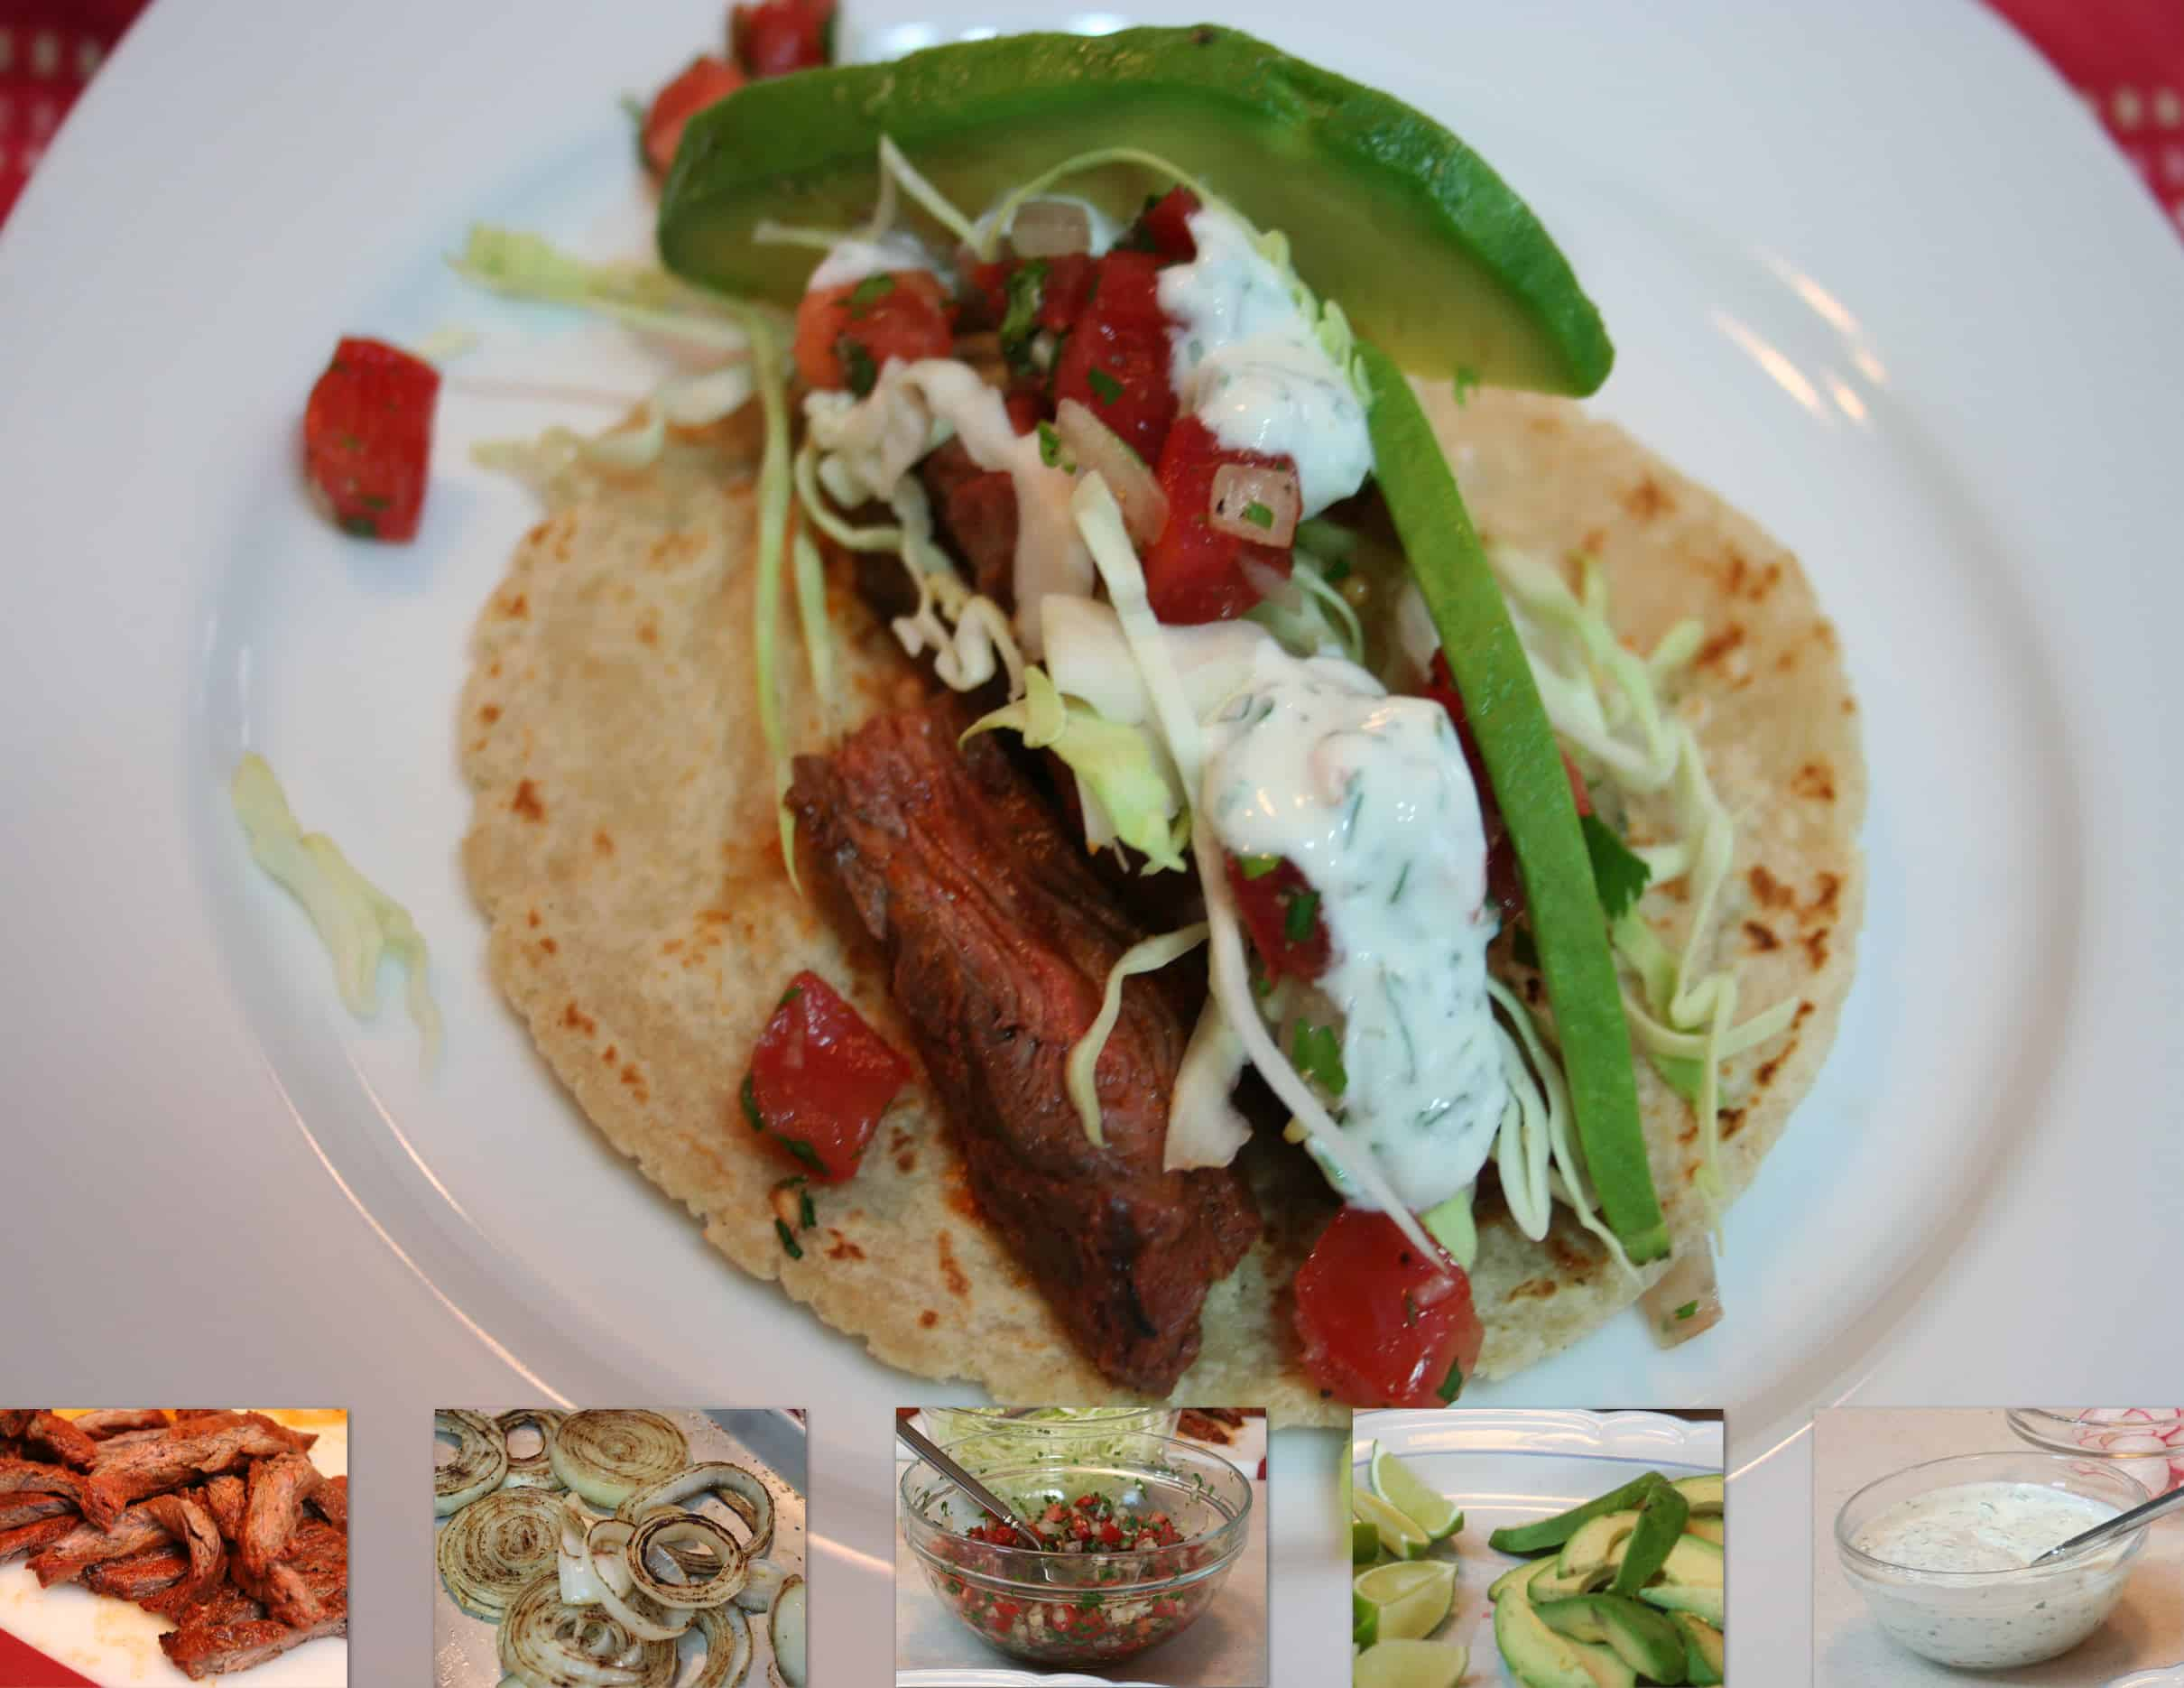 Chile-Spiced Skirt Steak Tacos